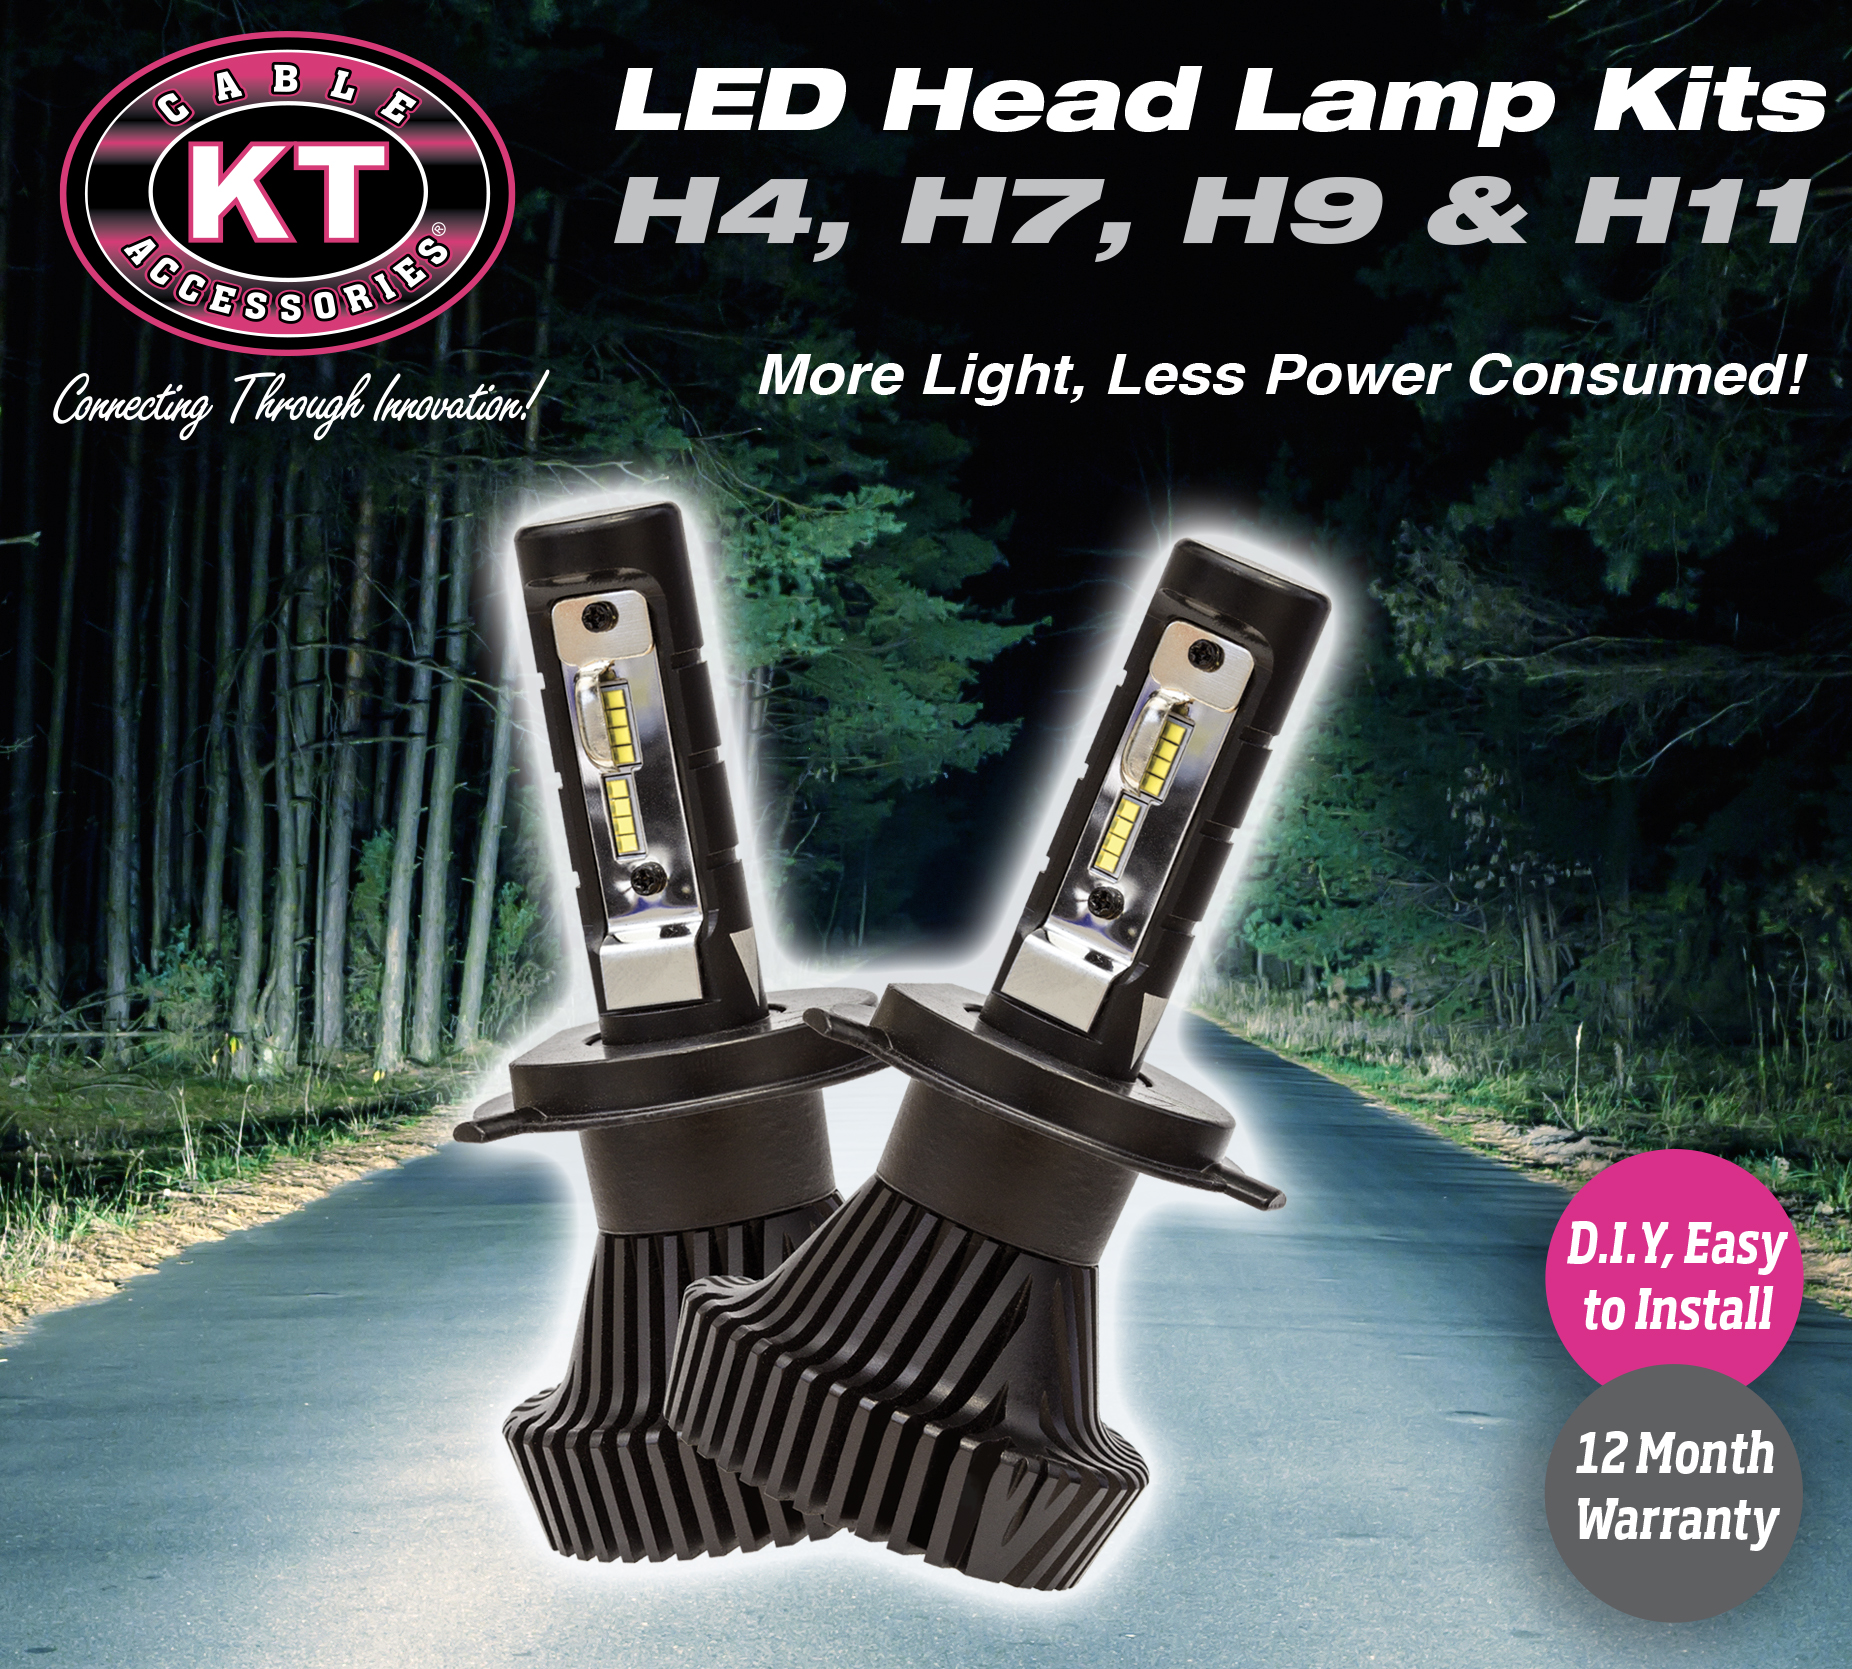 KT LED Headlamp Kits_Banner photo